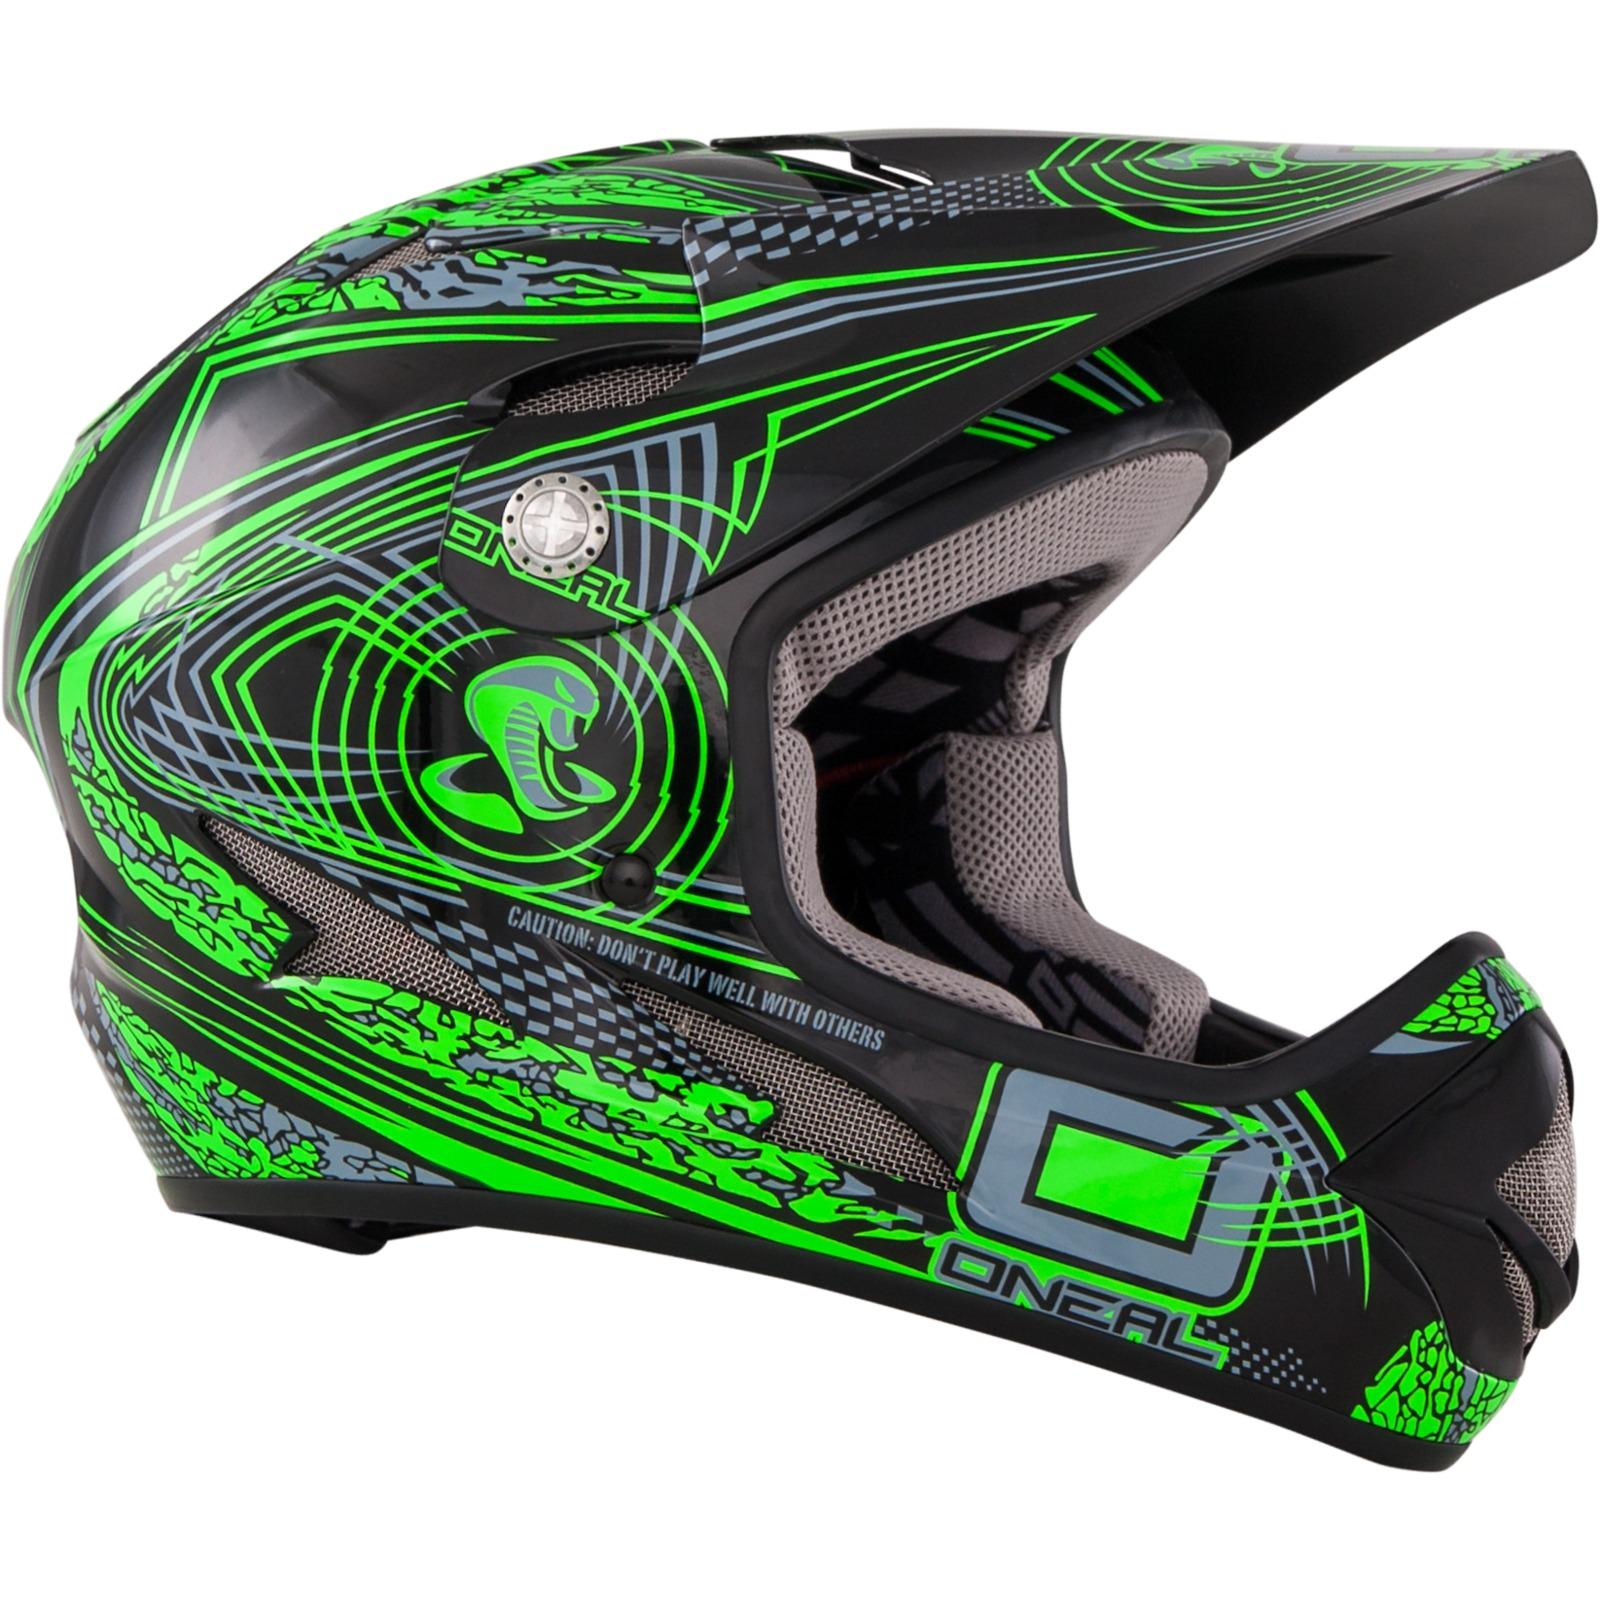 oneal backflip evo fidlock venture dh green cycle helmet. Black Bedroom Furniture Sets. Home Design Ideas